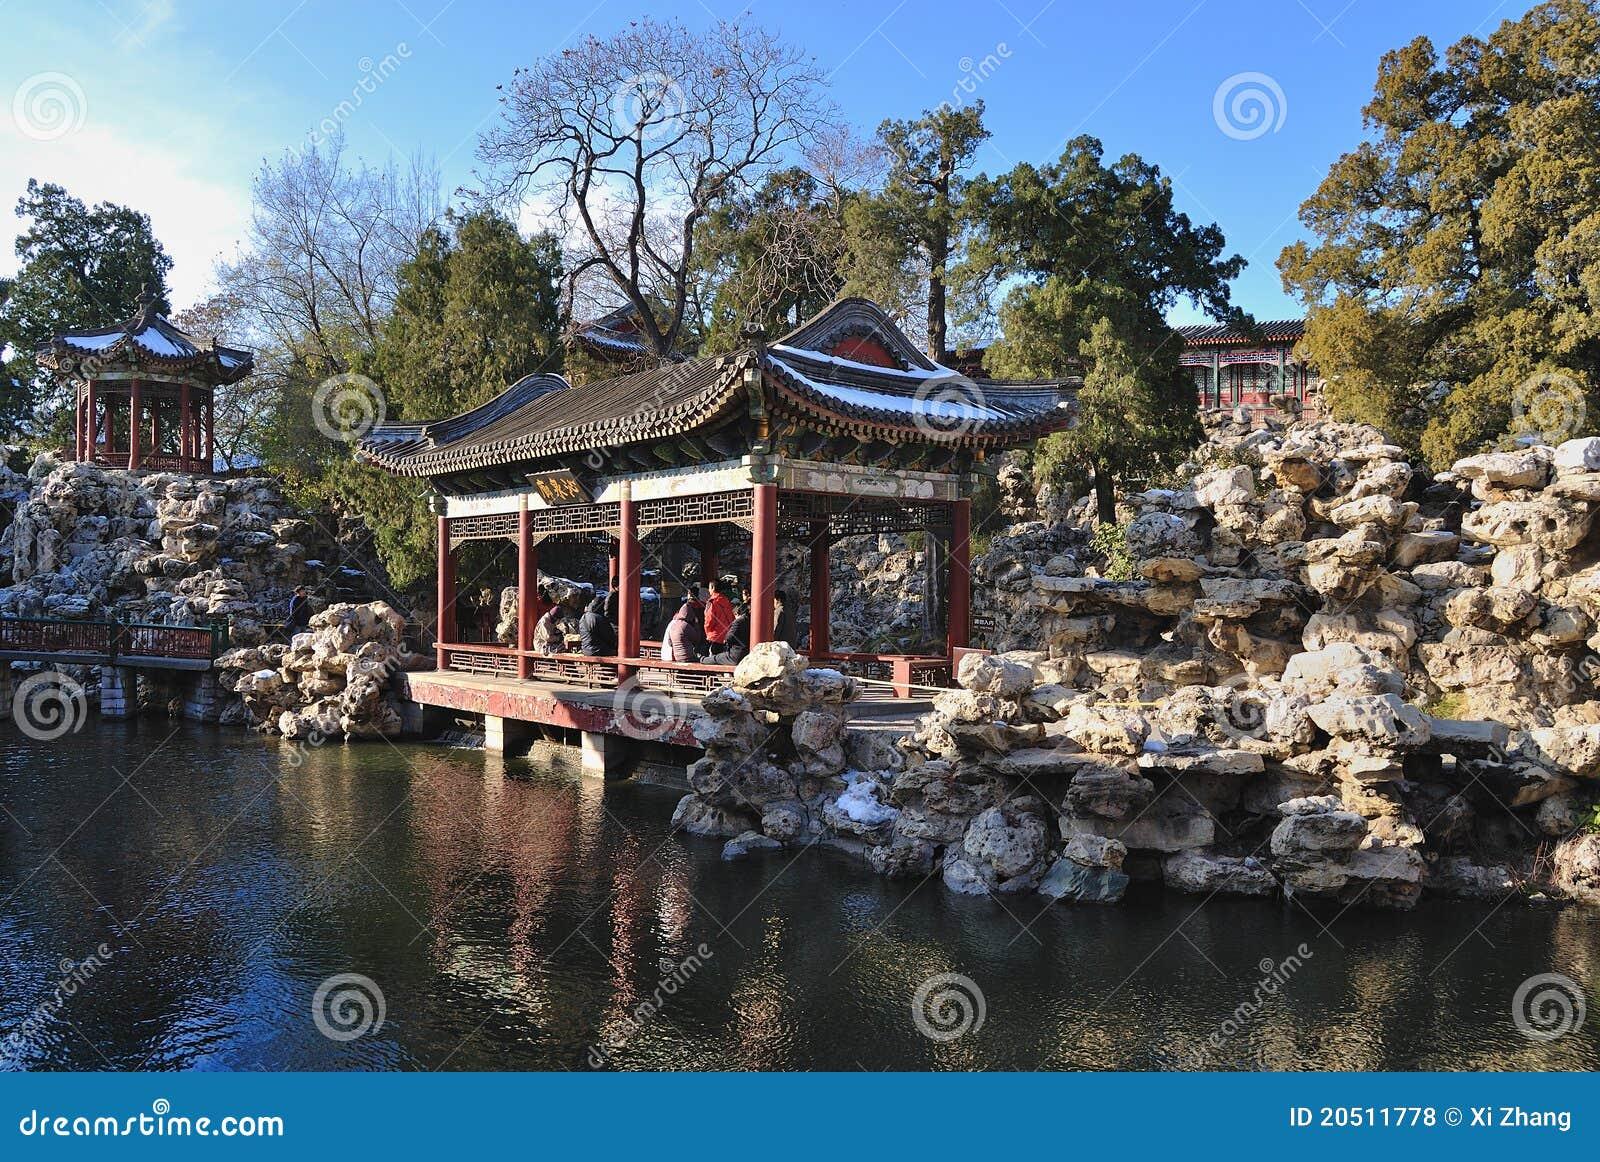 download china garden beihai park beijing editorial stock photo image of pavilions - North China Garden